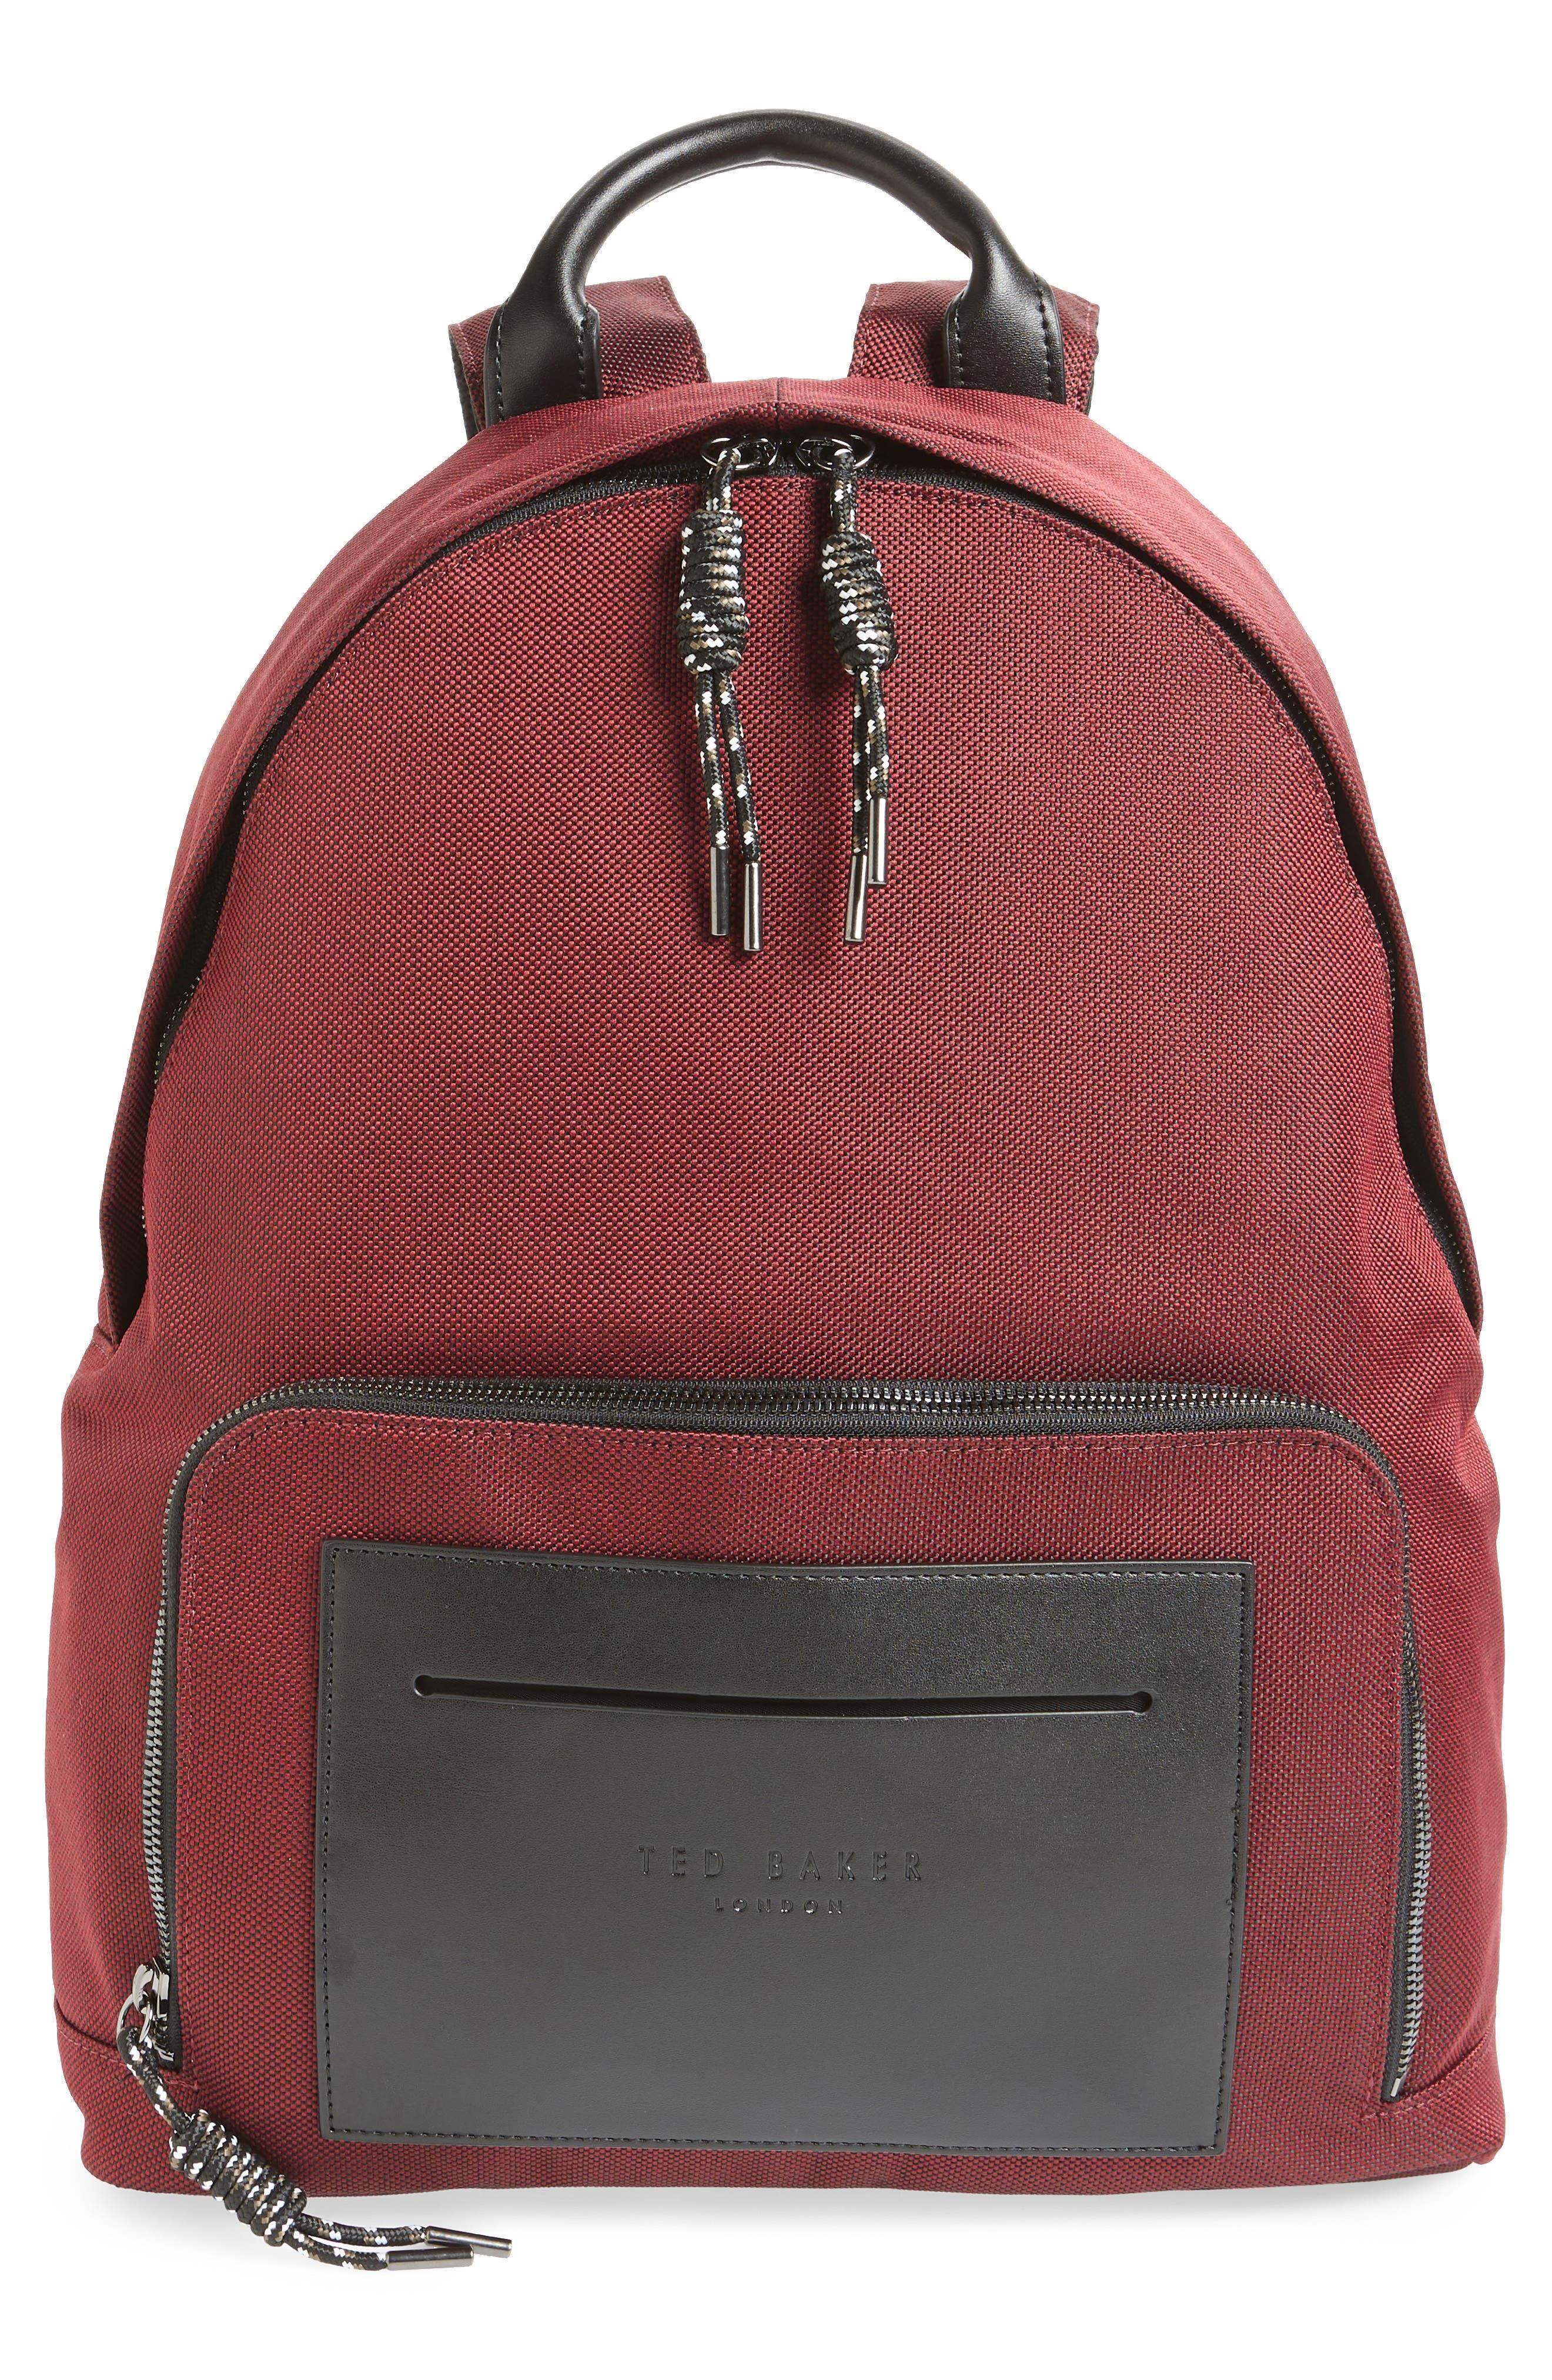 Filer Backpack,                             Main thumbnail 1, color,                             RED